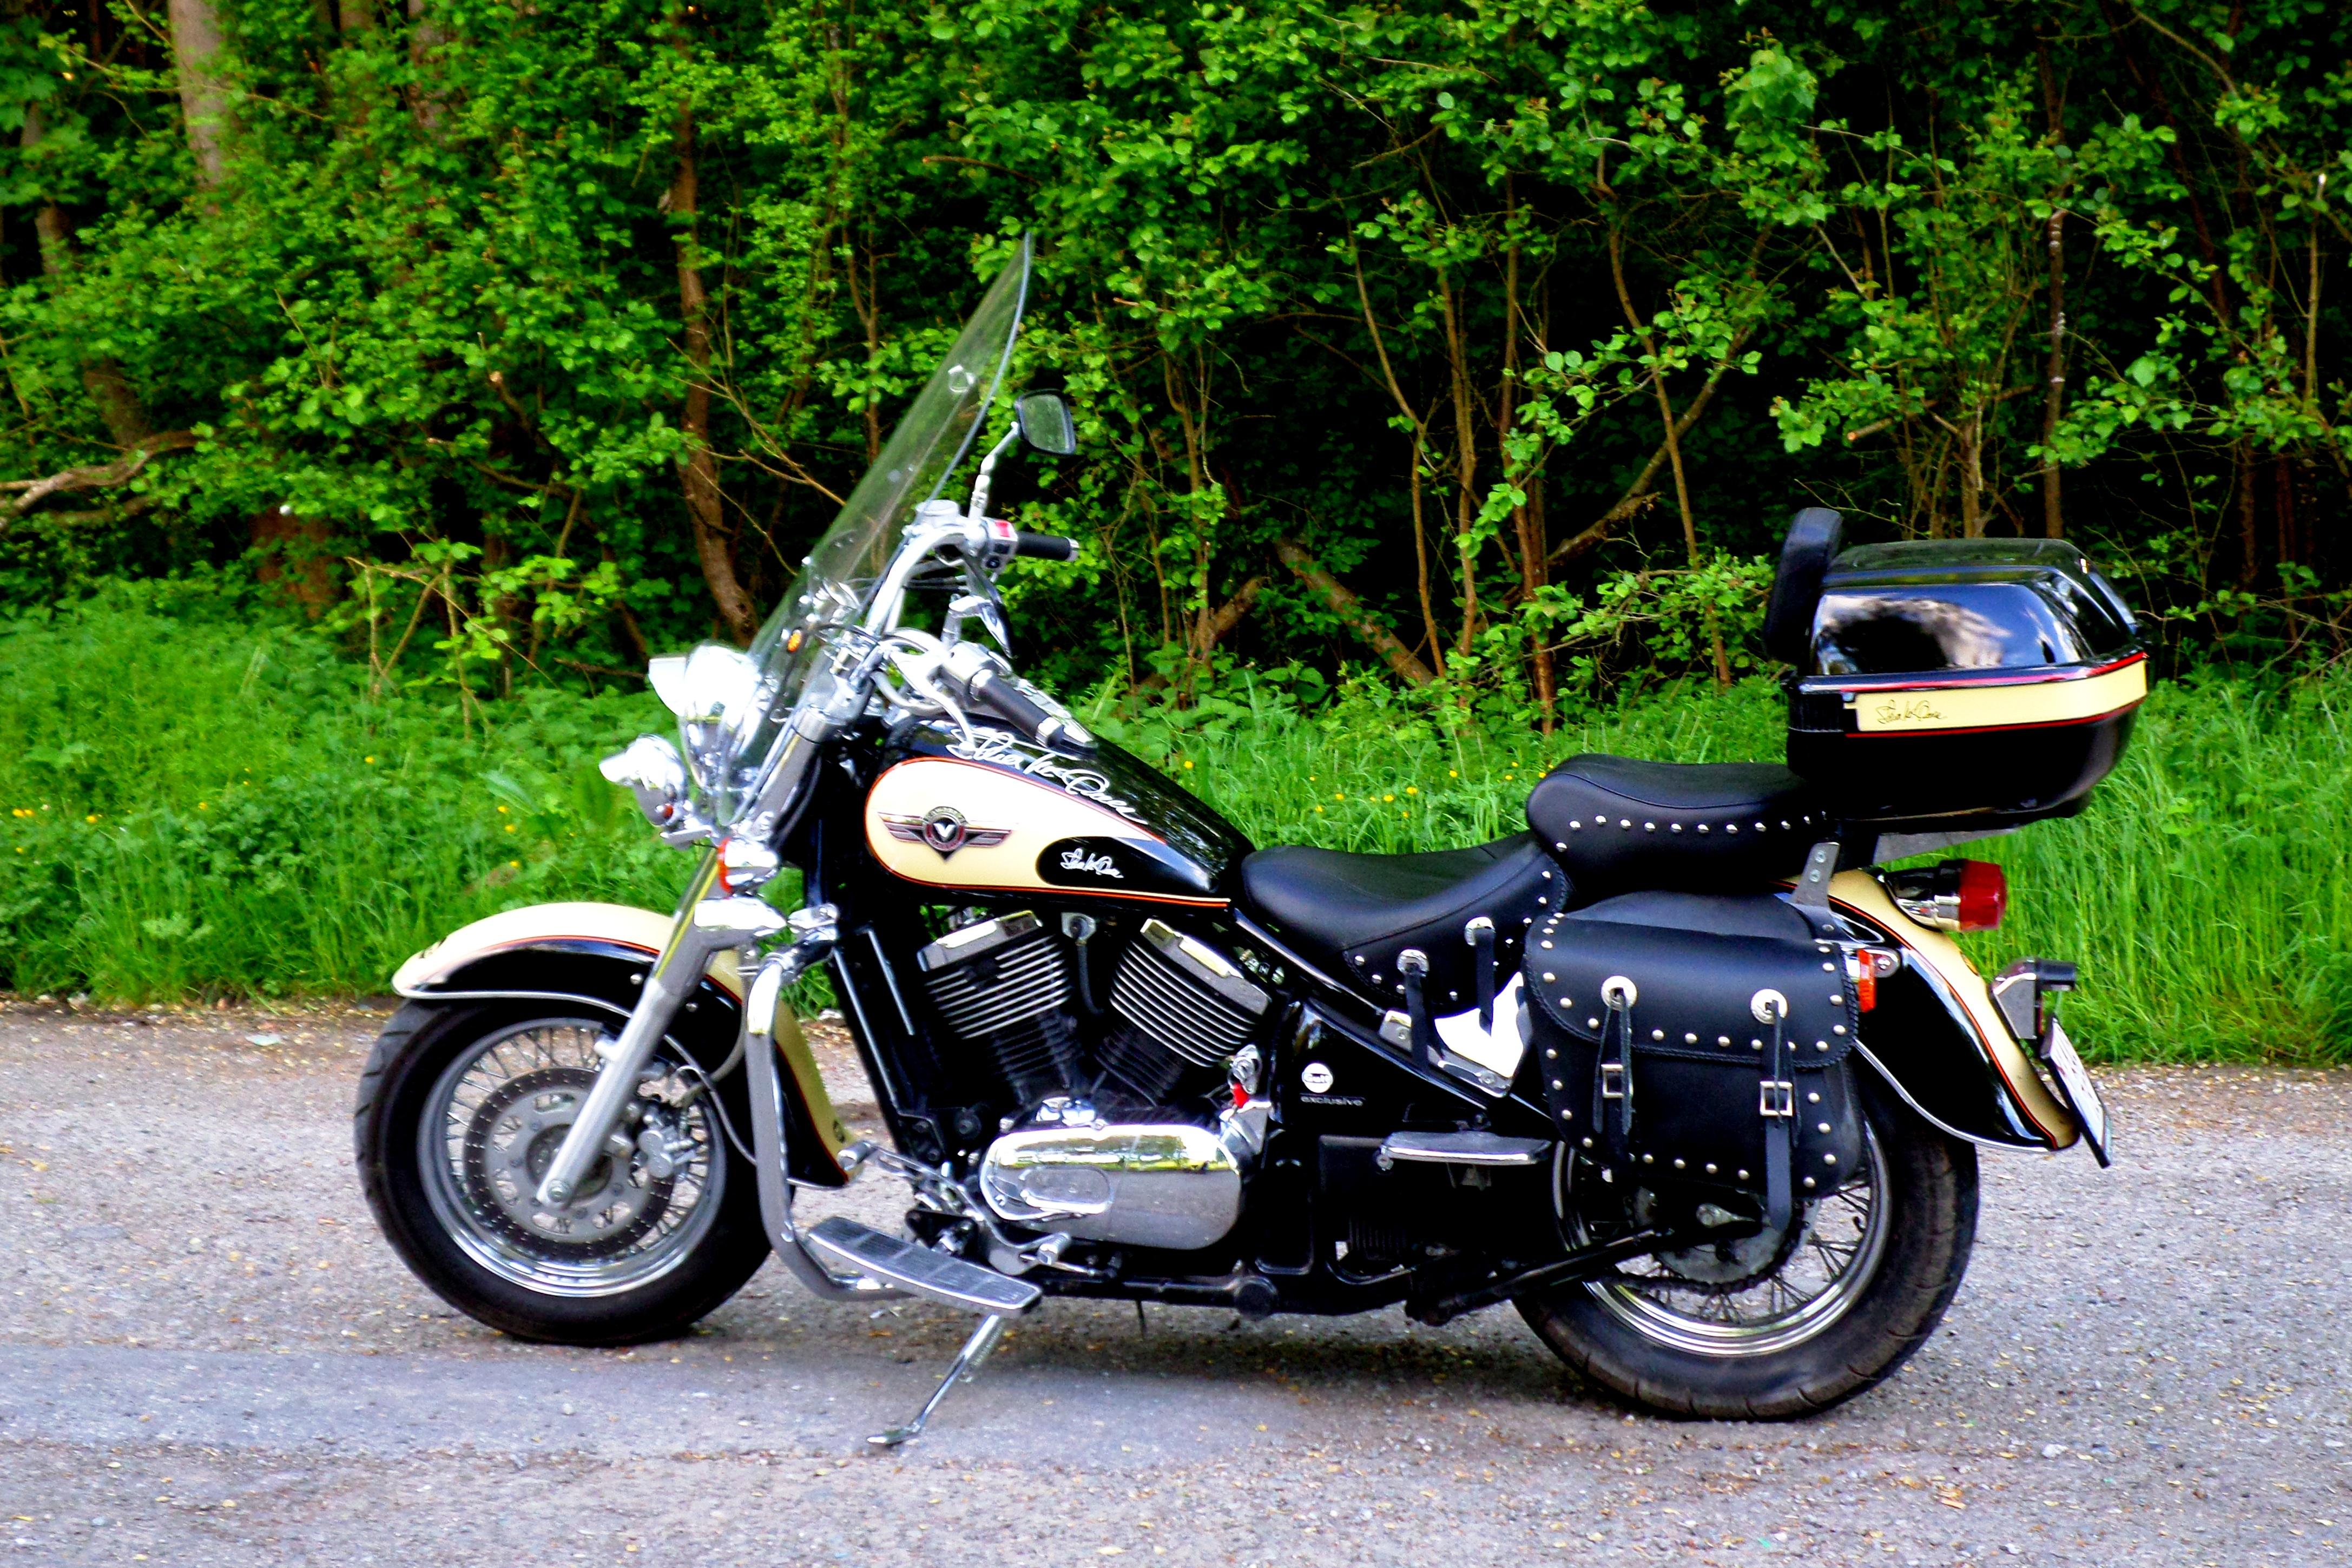 Kawasaki Vulcan Classic For Sale Uk